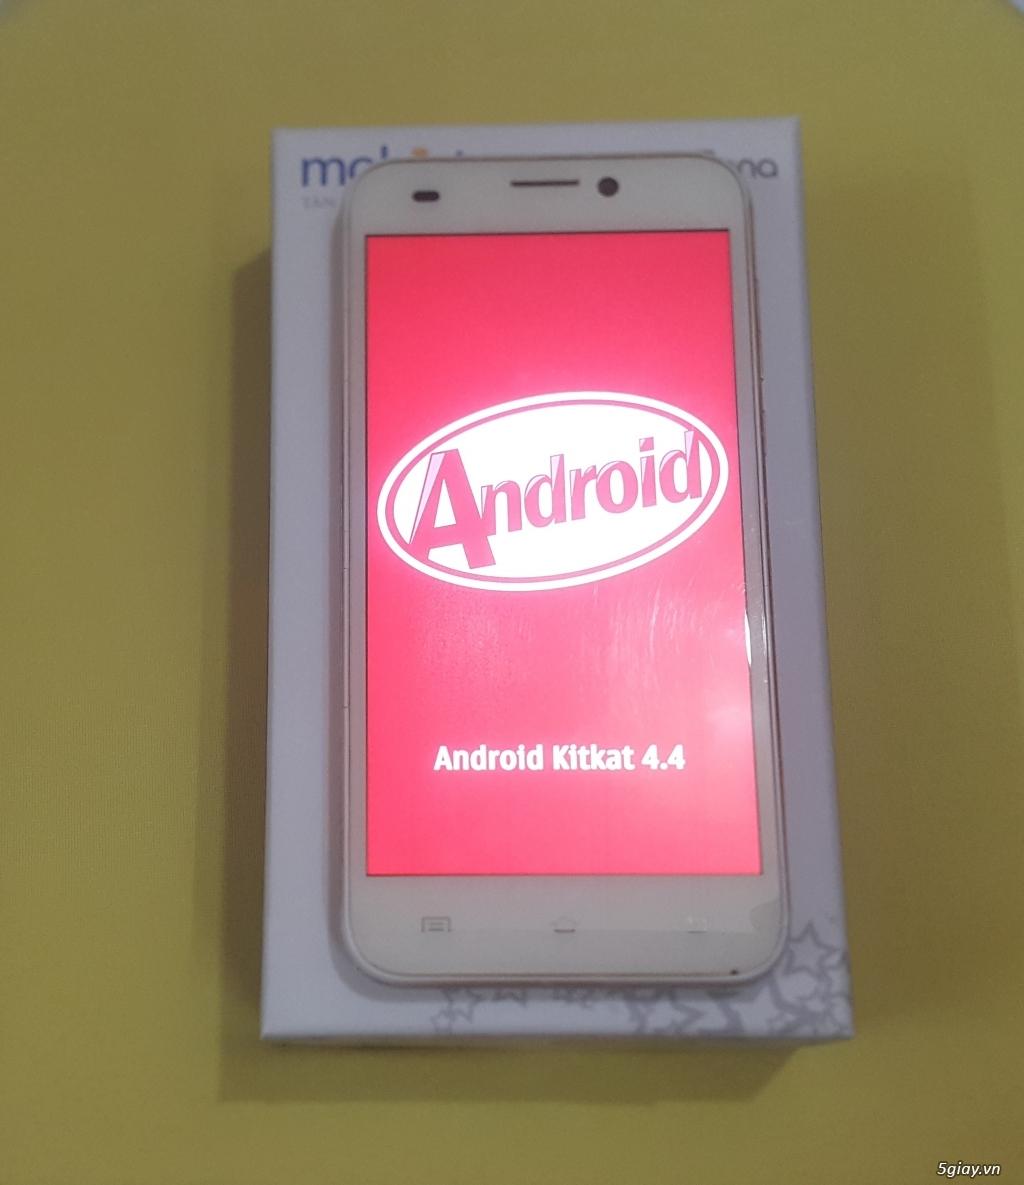 Sky A830, Mobiistar Lai Zena 5inch Fullbox, Blackberry 8700, Nokia phổ thông v.v .... giao lưu - 3